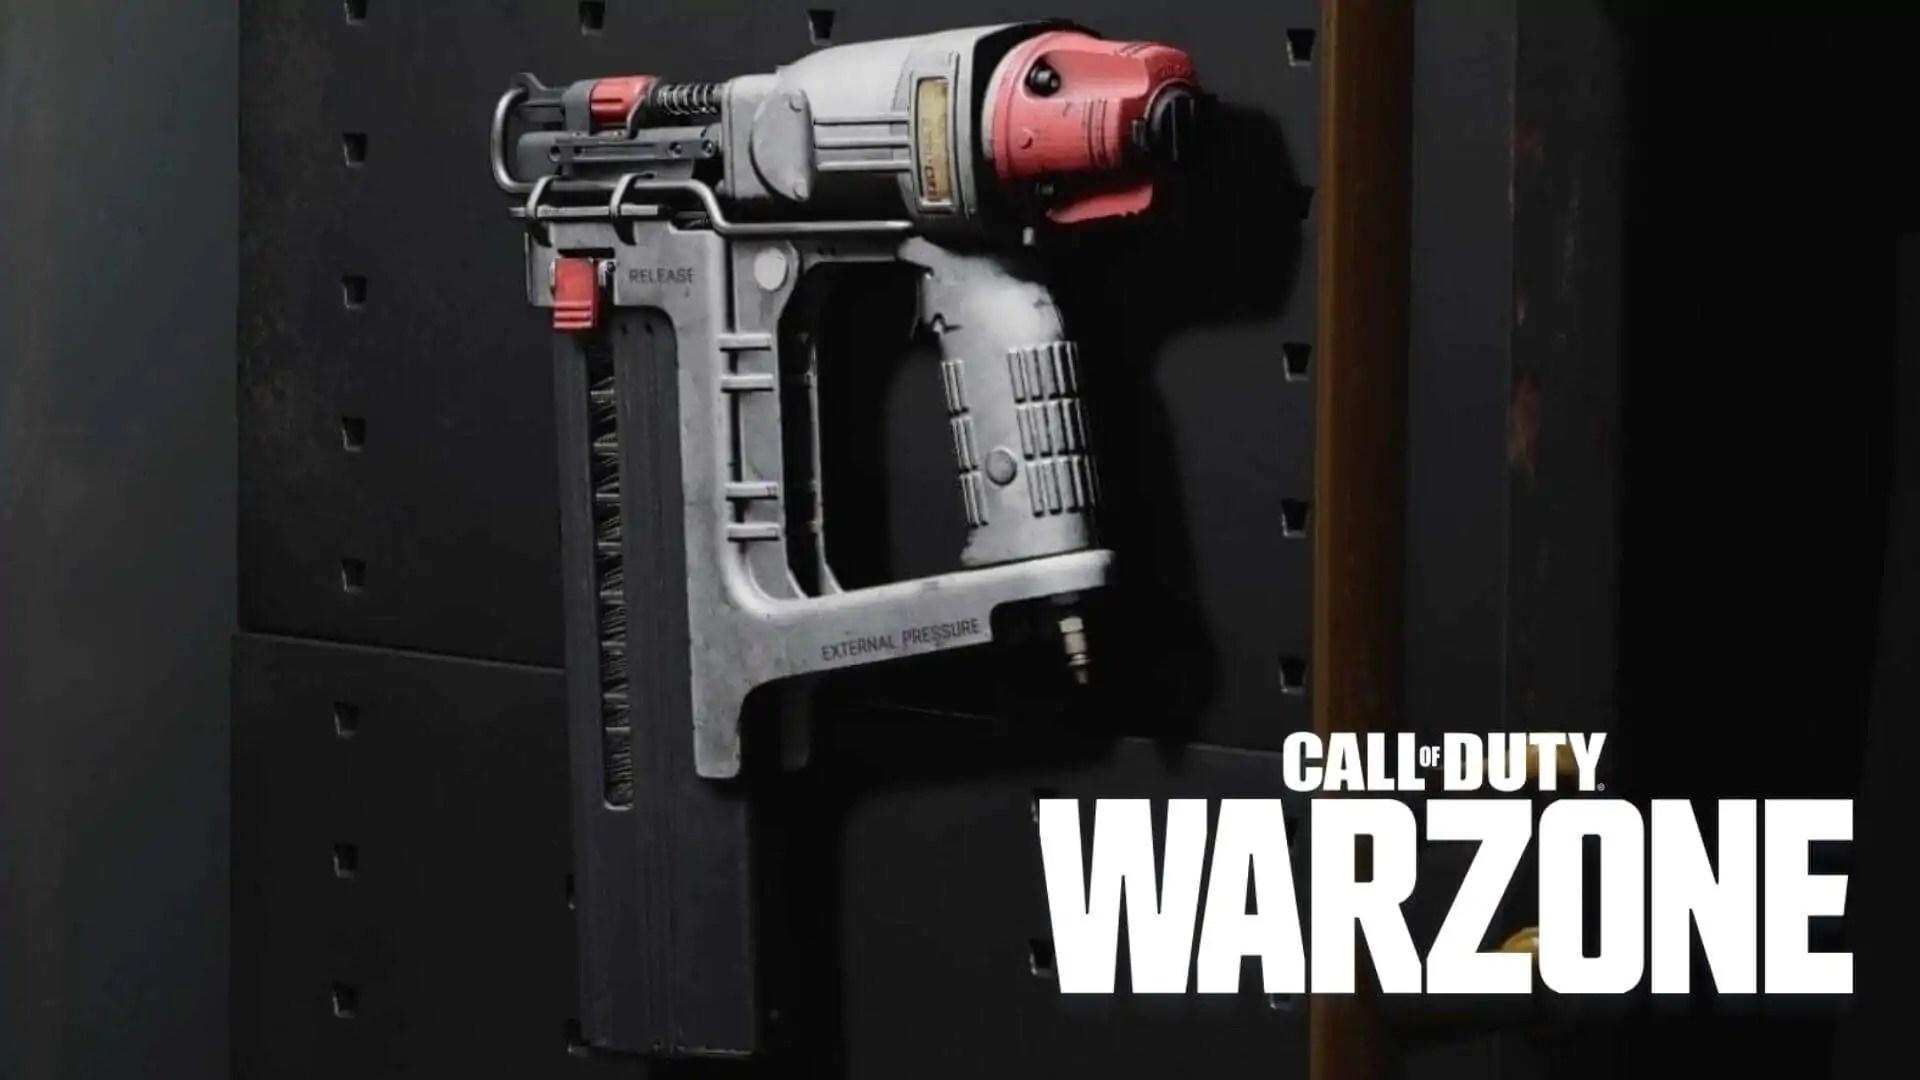 CoD Warzone: